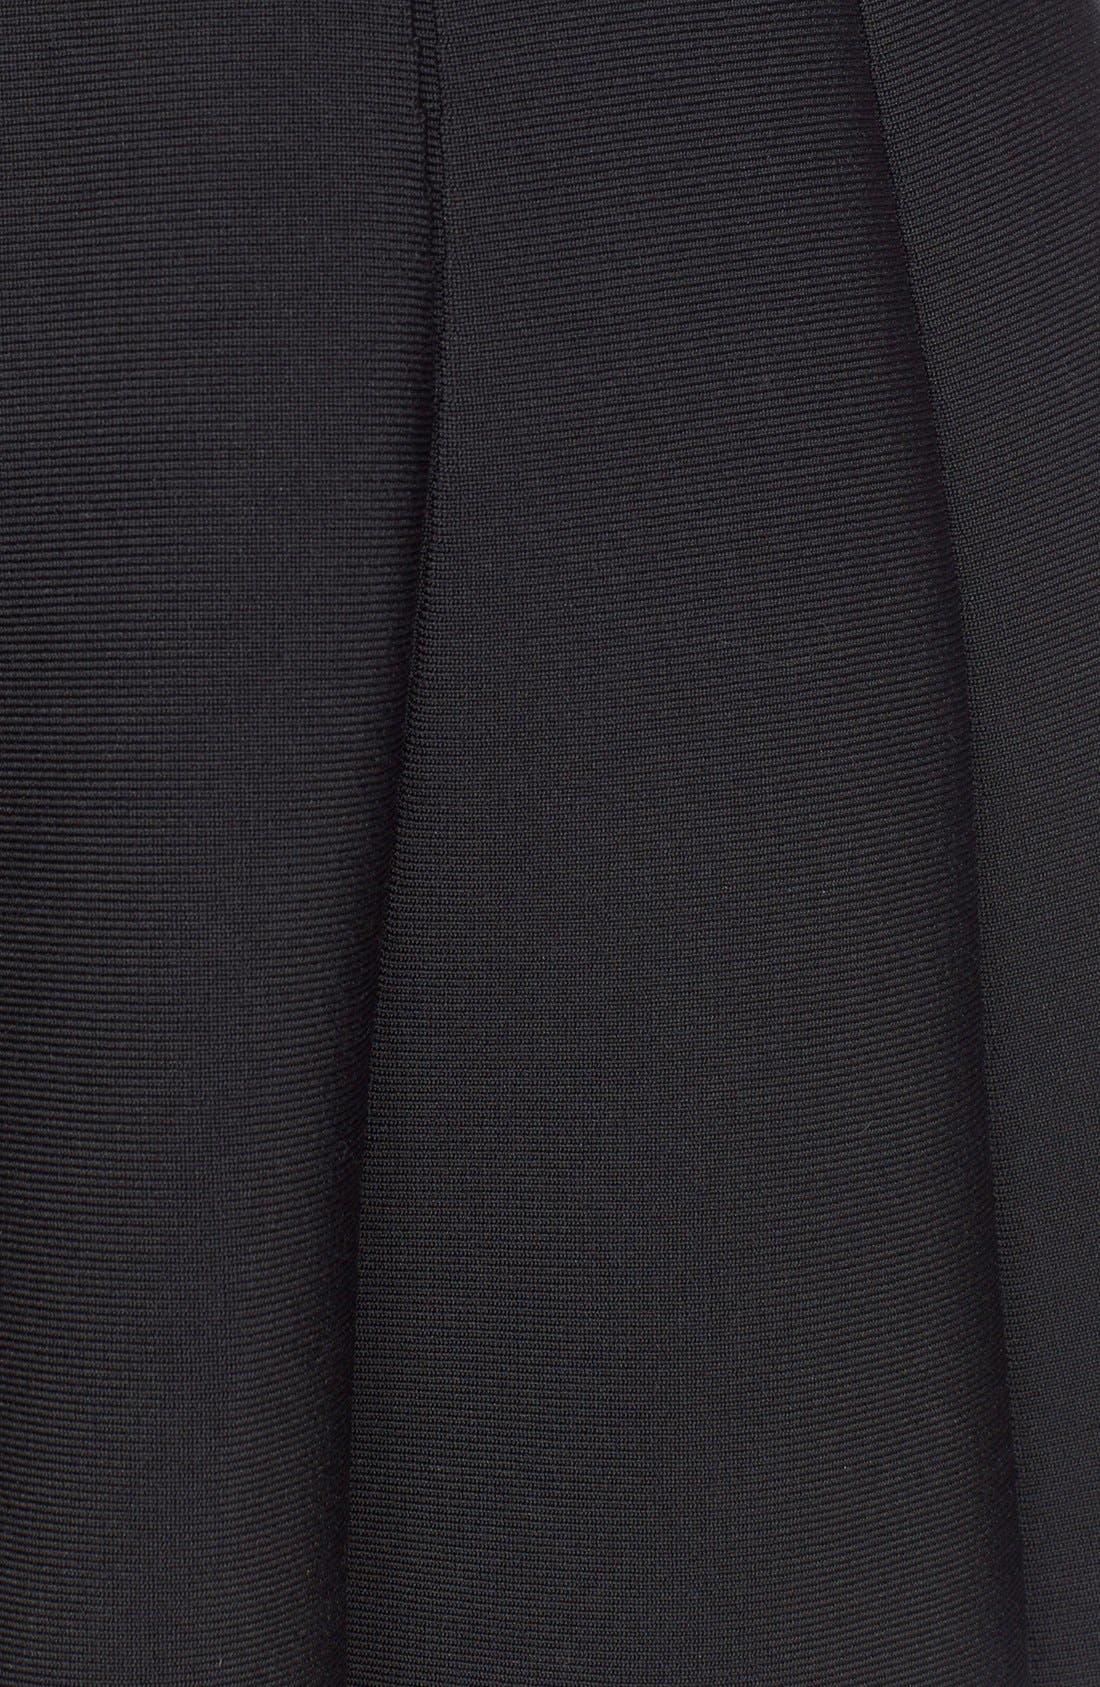 Alternate Image 3  - Parker 'Zoey' Pleat A-Line Skirt